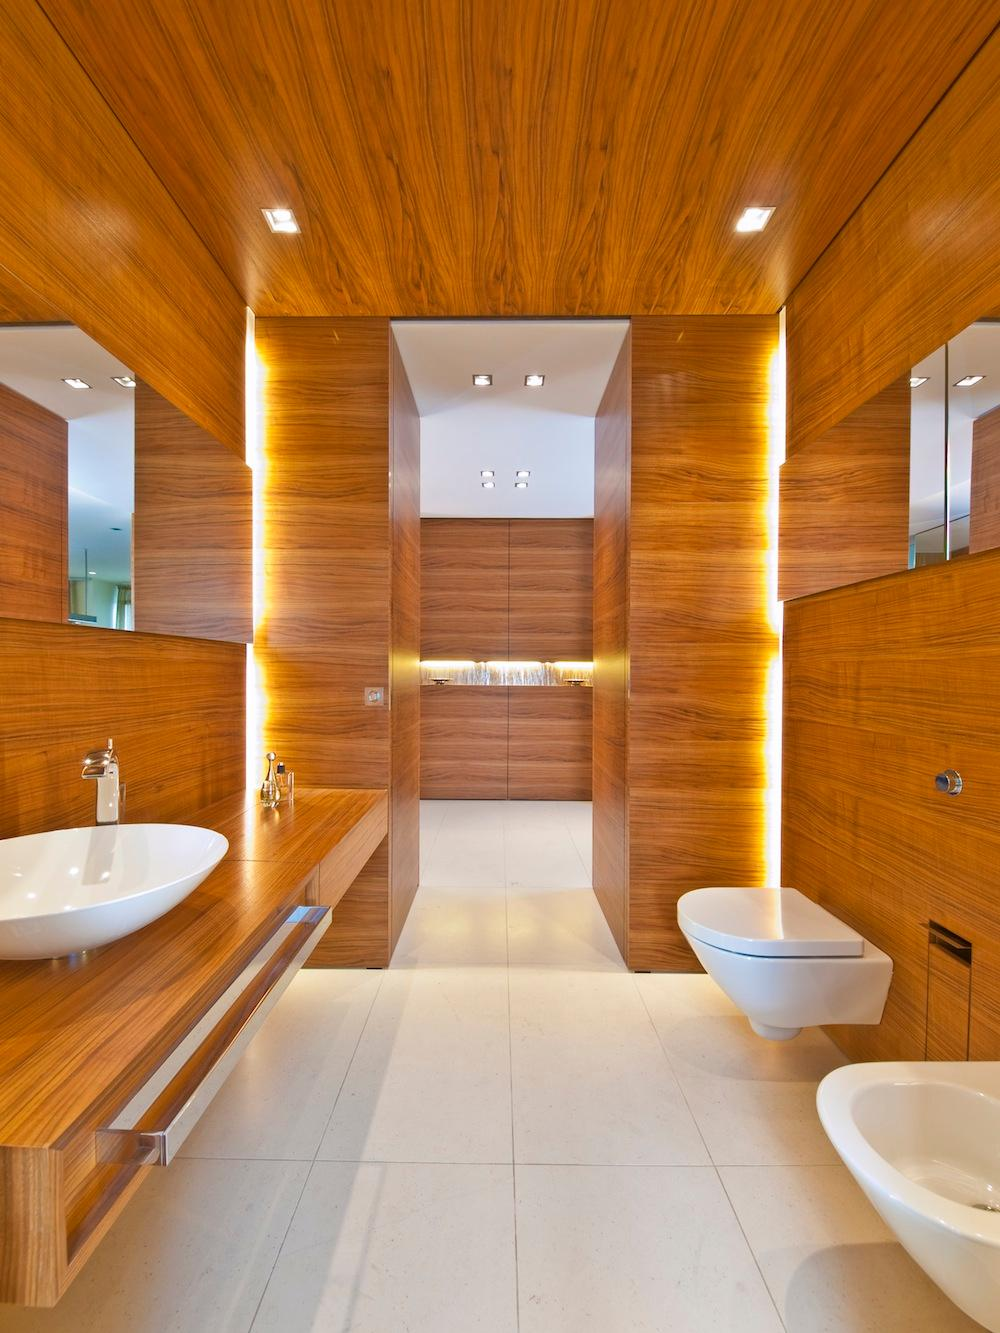 Badezimmer Holz Bilder Ideen Couch